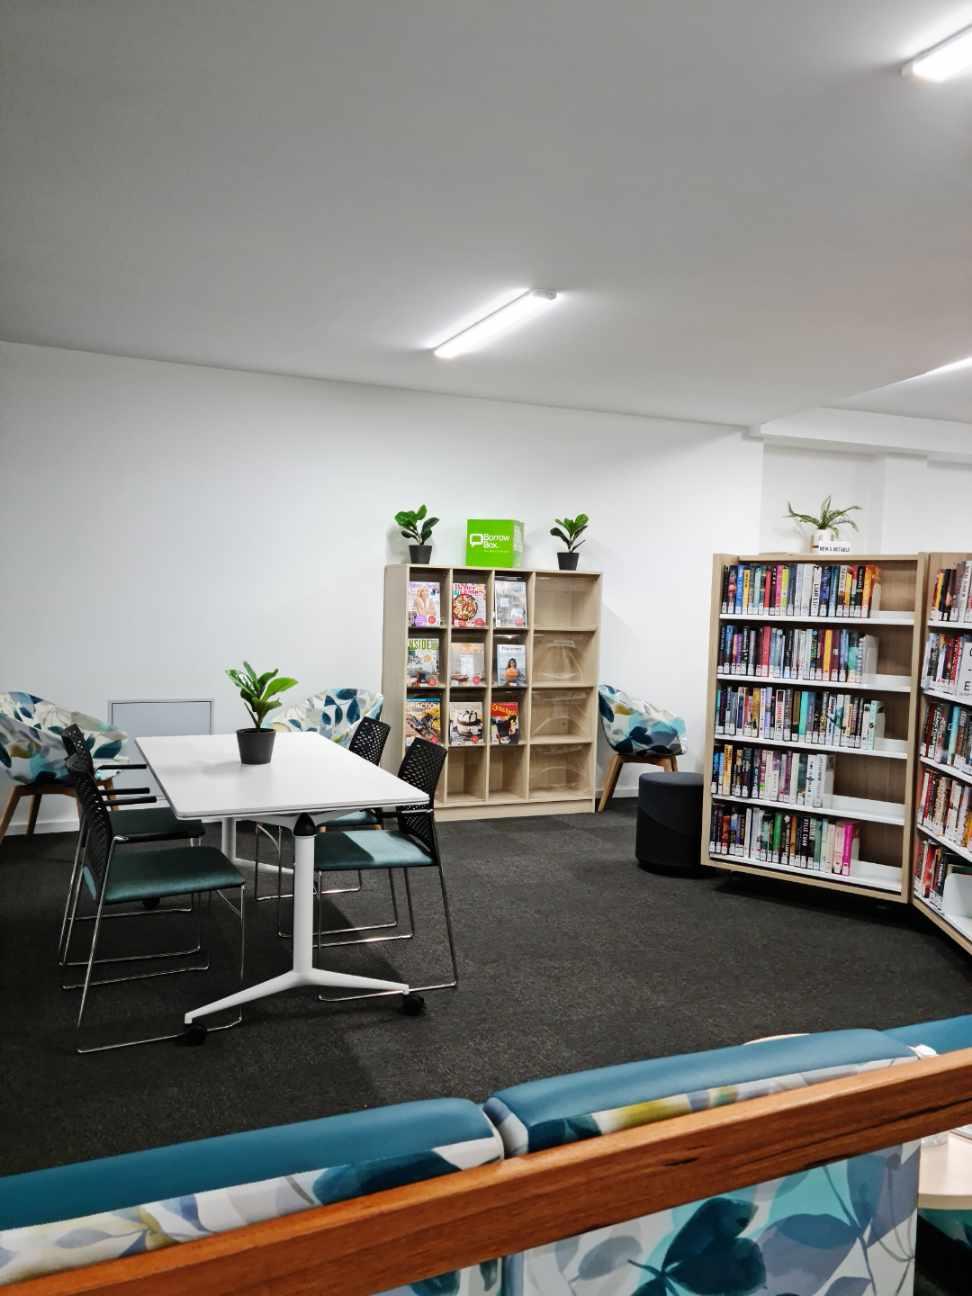 San Remo Library | library | 92 Back Beach Rd, San Remo VIC 3925, Australia | 0359522842 OR +61 3 5952 2842